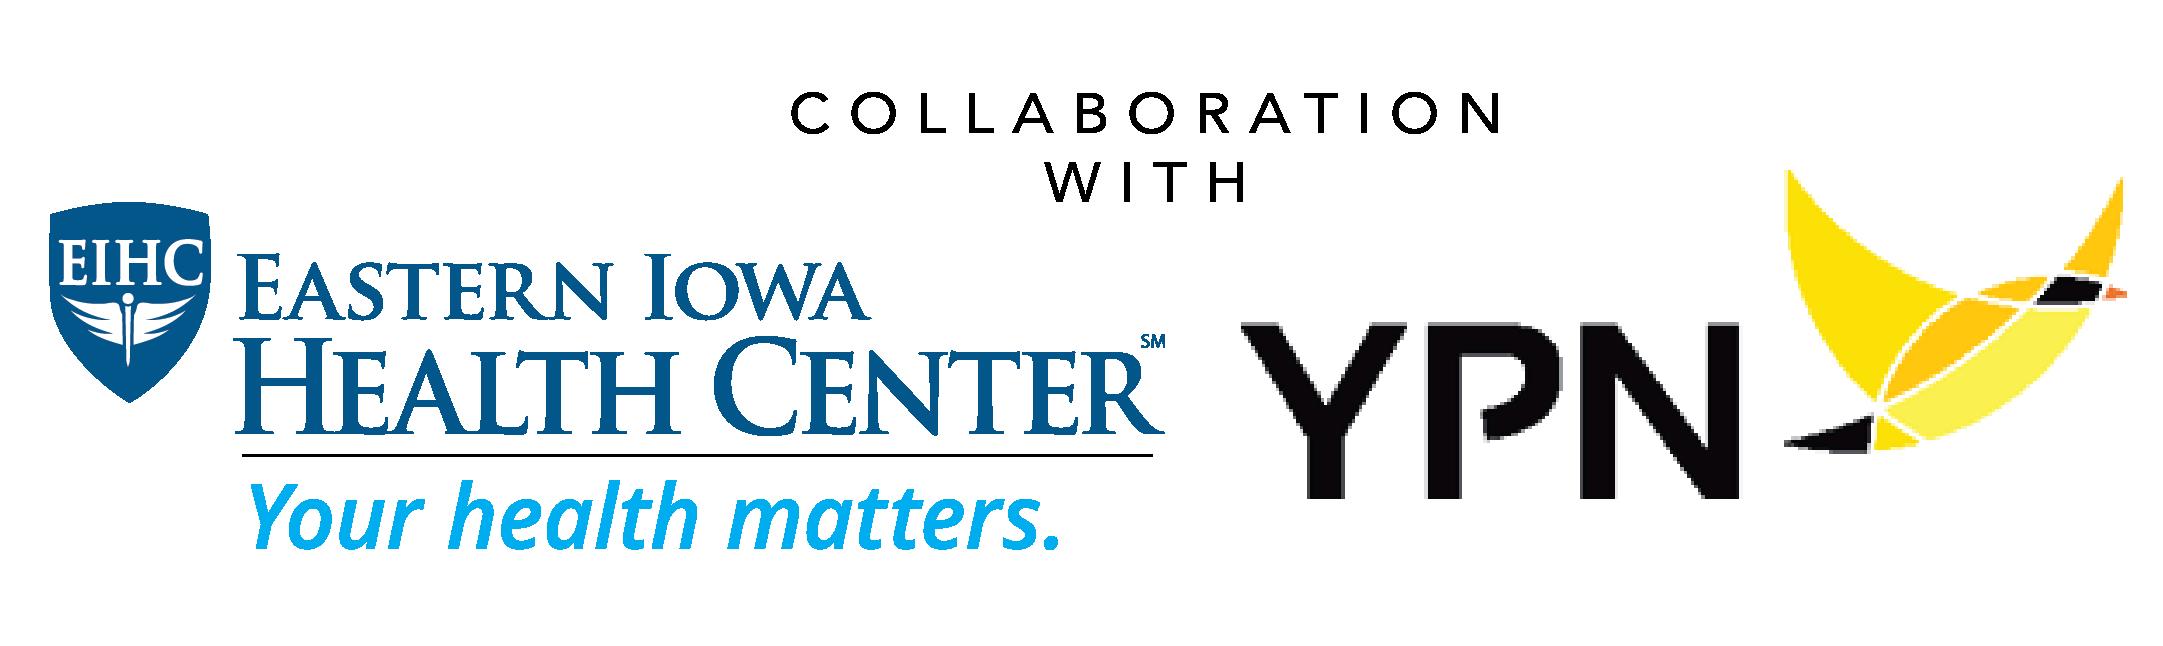 Eastern Iowa Diaper Bank Collaboration